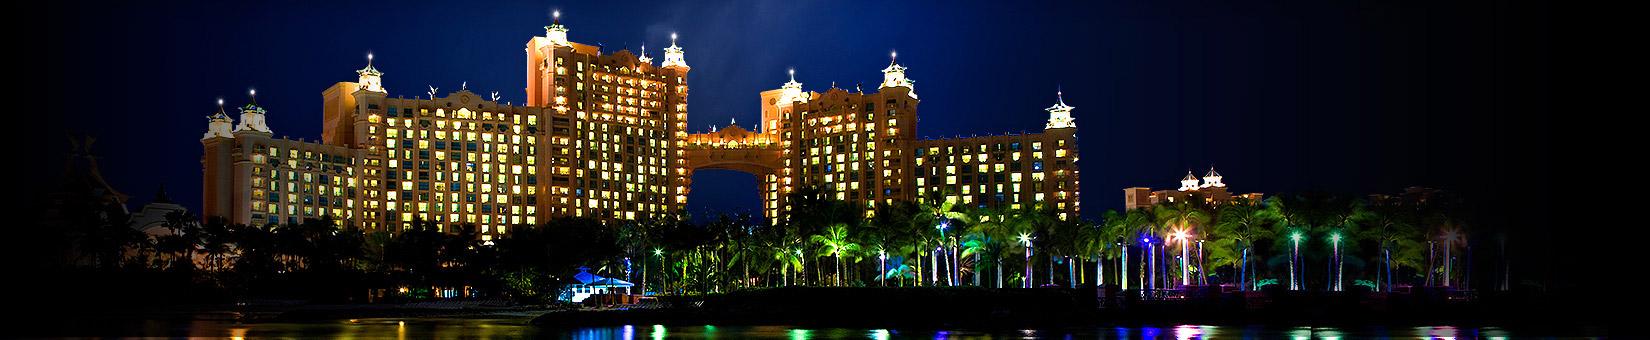 PokerStars Caribbean Adventure - Poker Tournaments in The ...